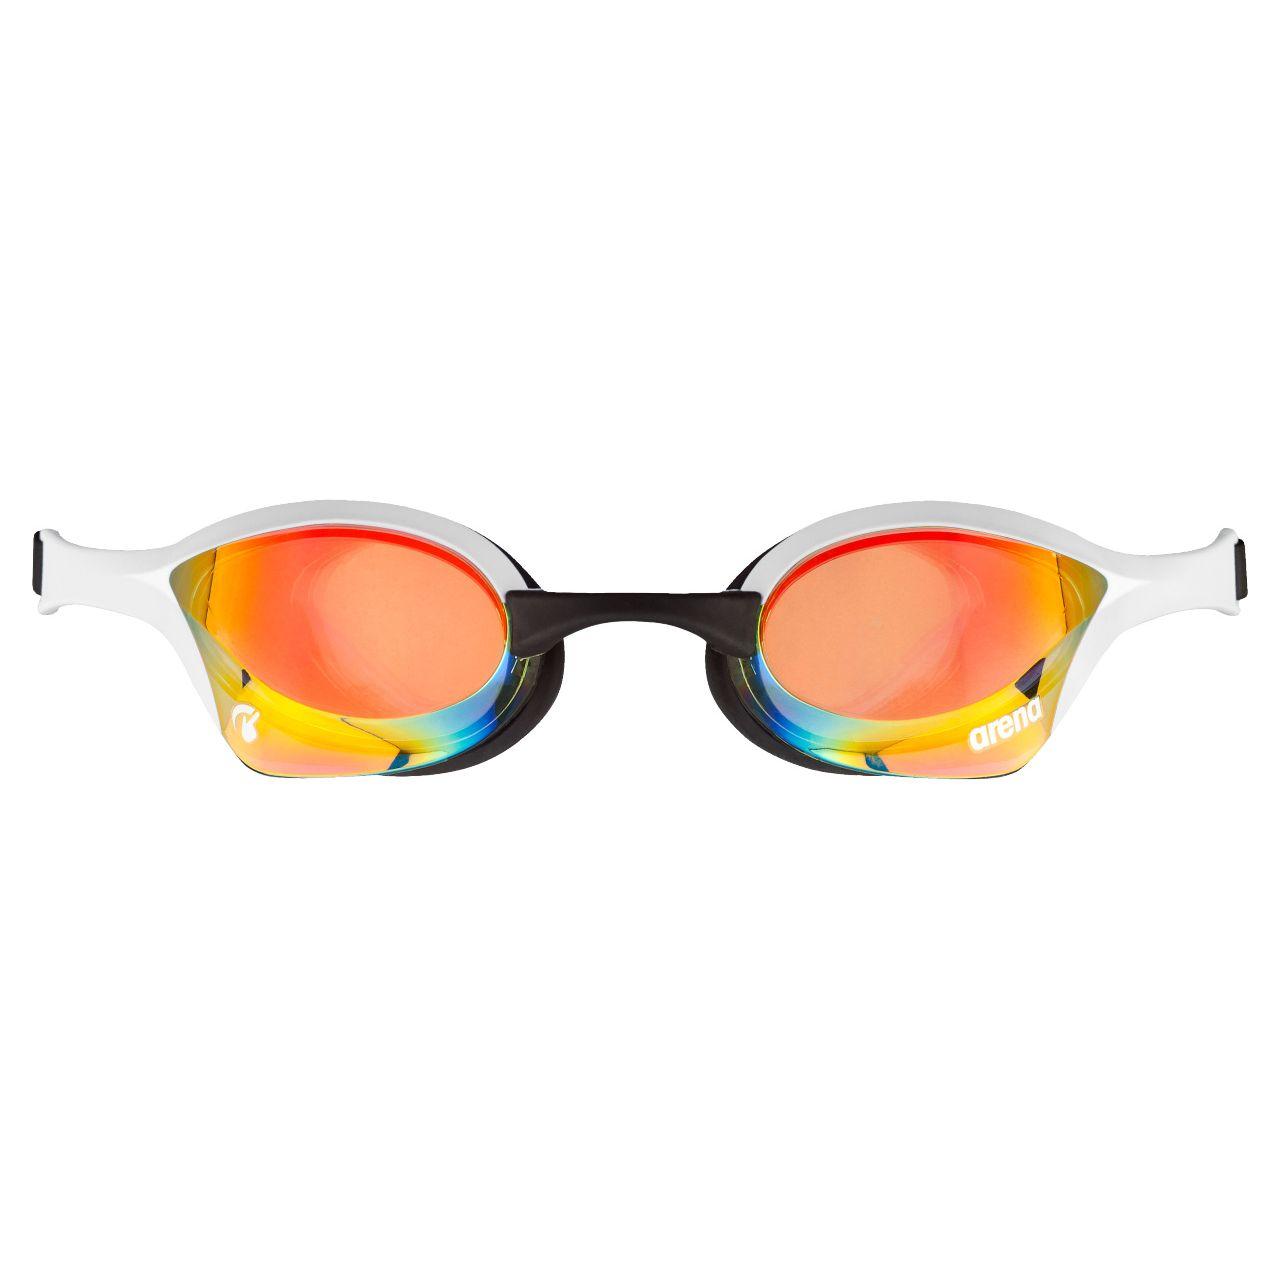 Goggles de Natación para Competición arena Unisex Cobra Ultra Swipe Mirror_6242